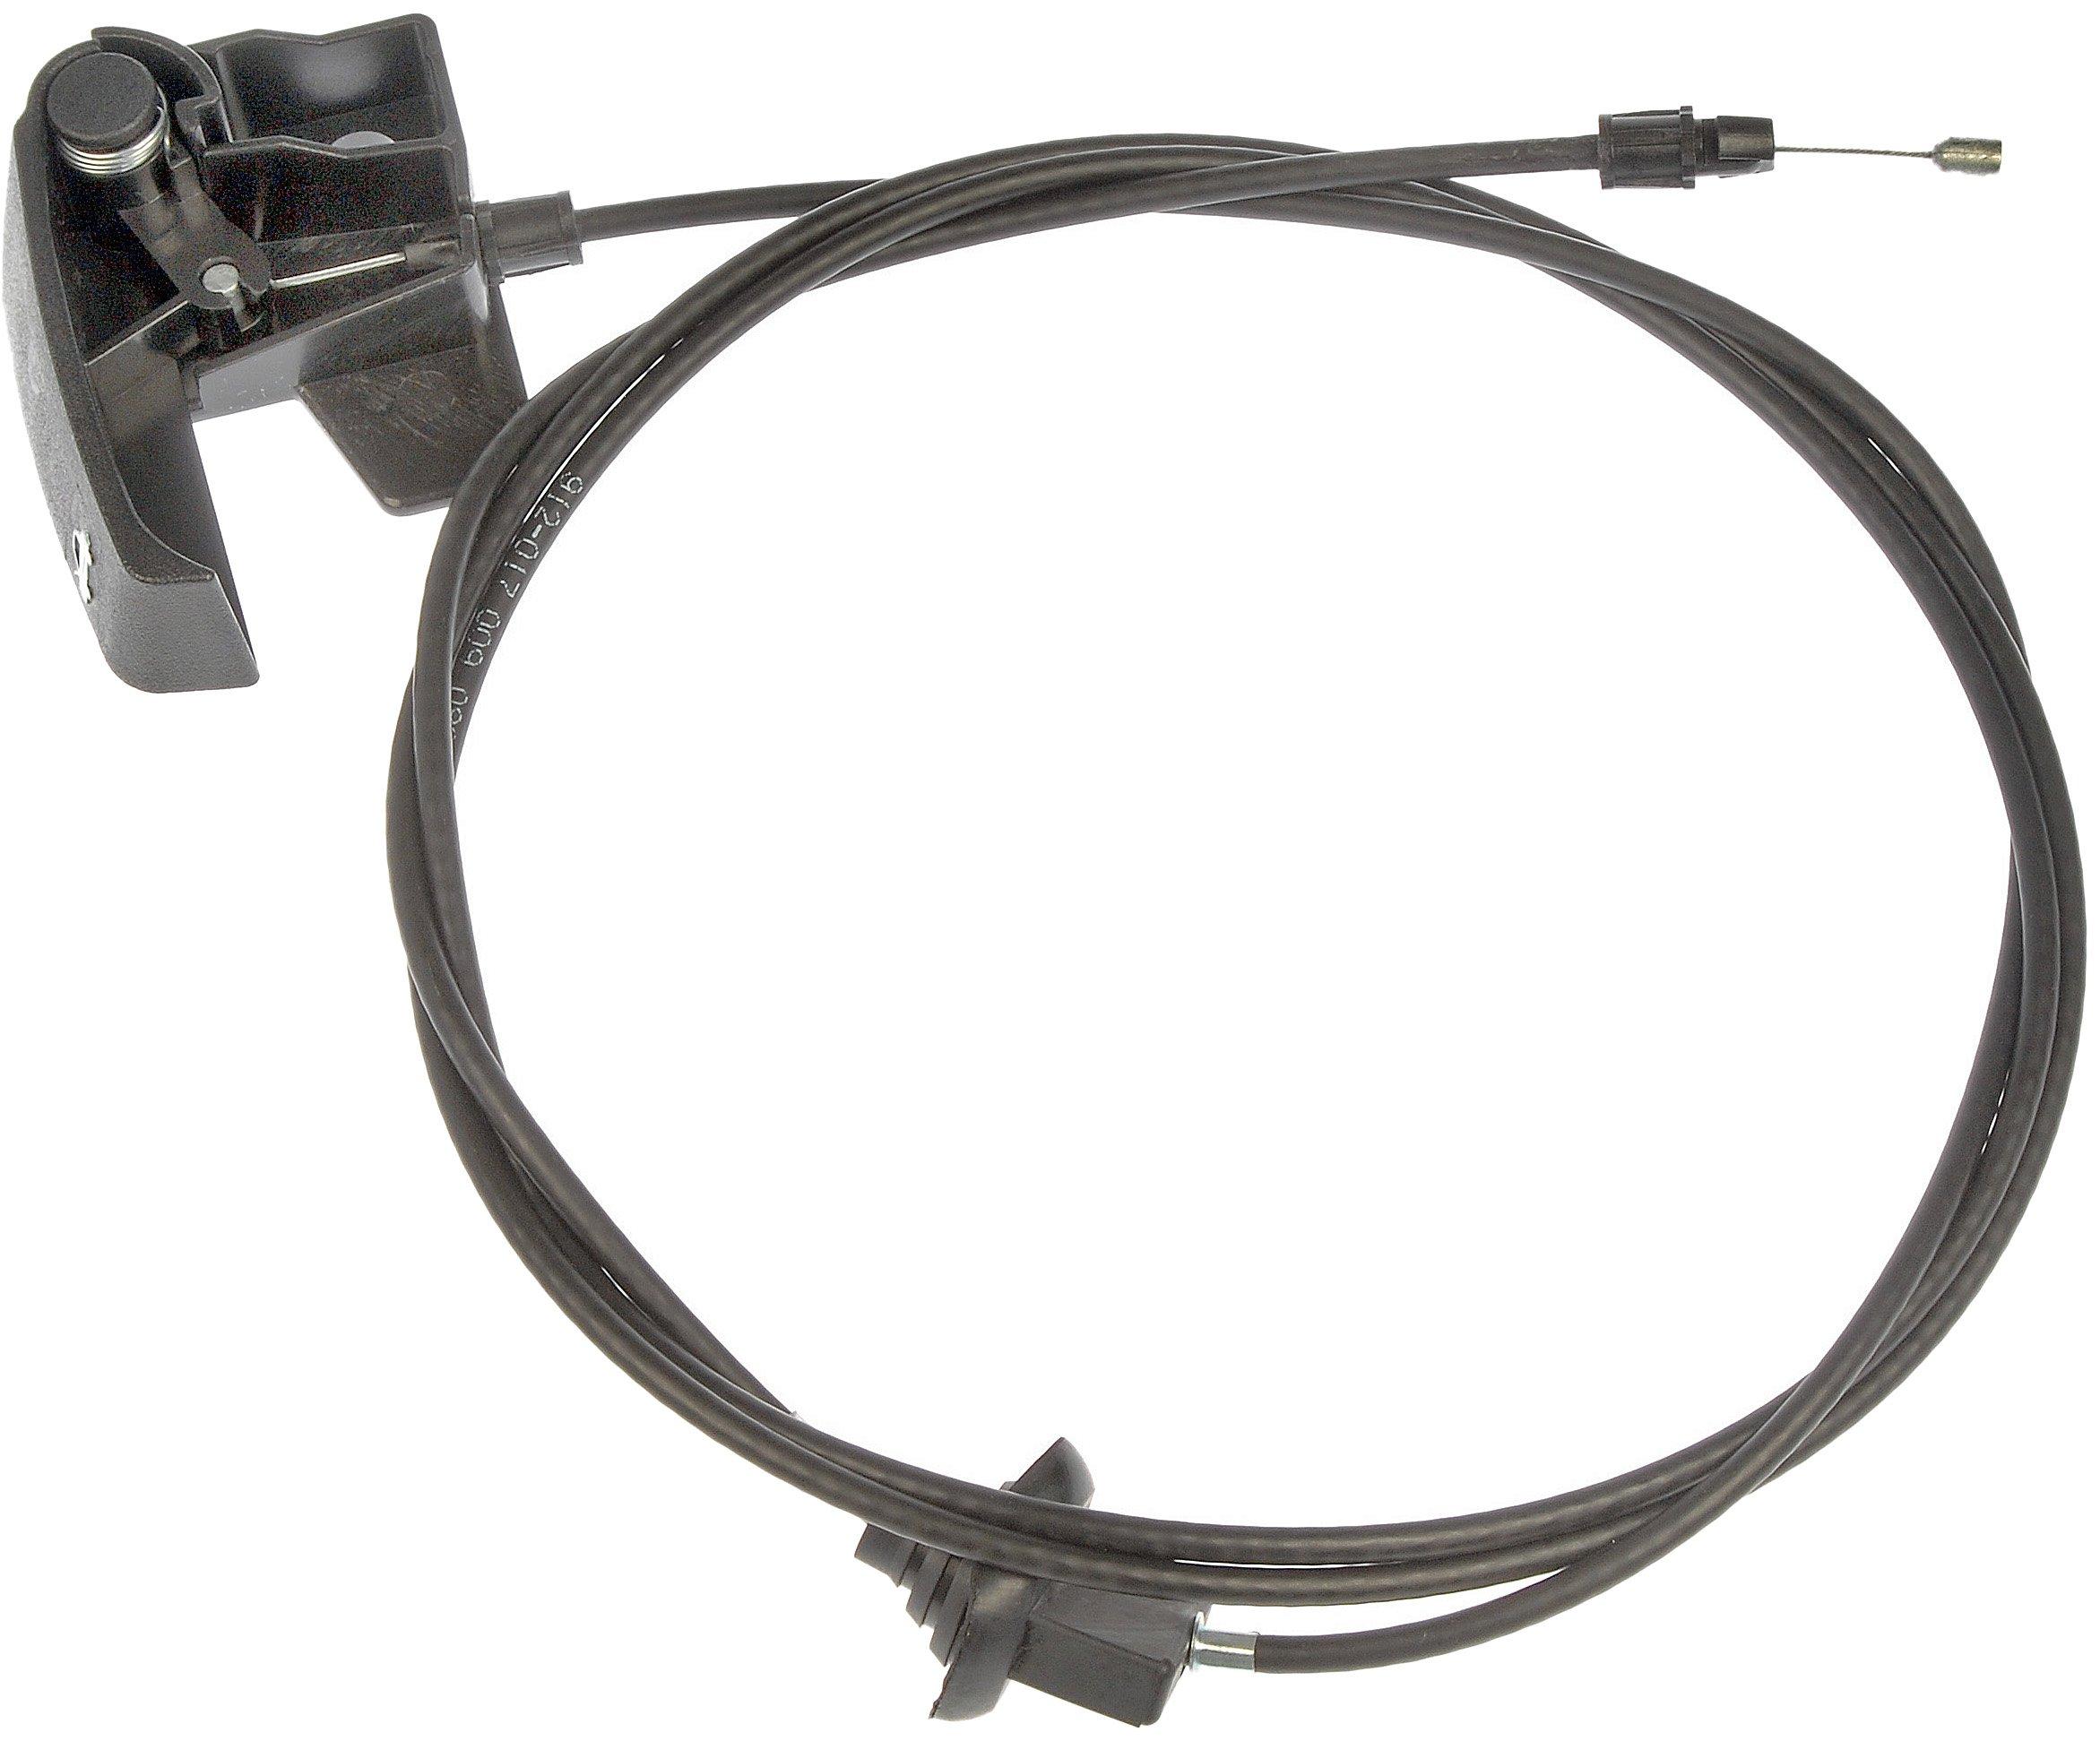 Dorman 912-017 Hood Release Cable by Dorman